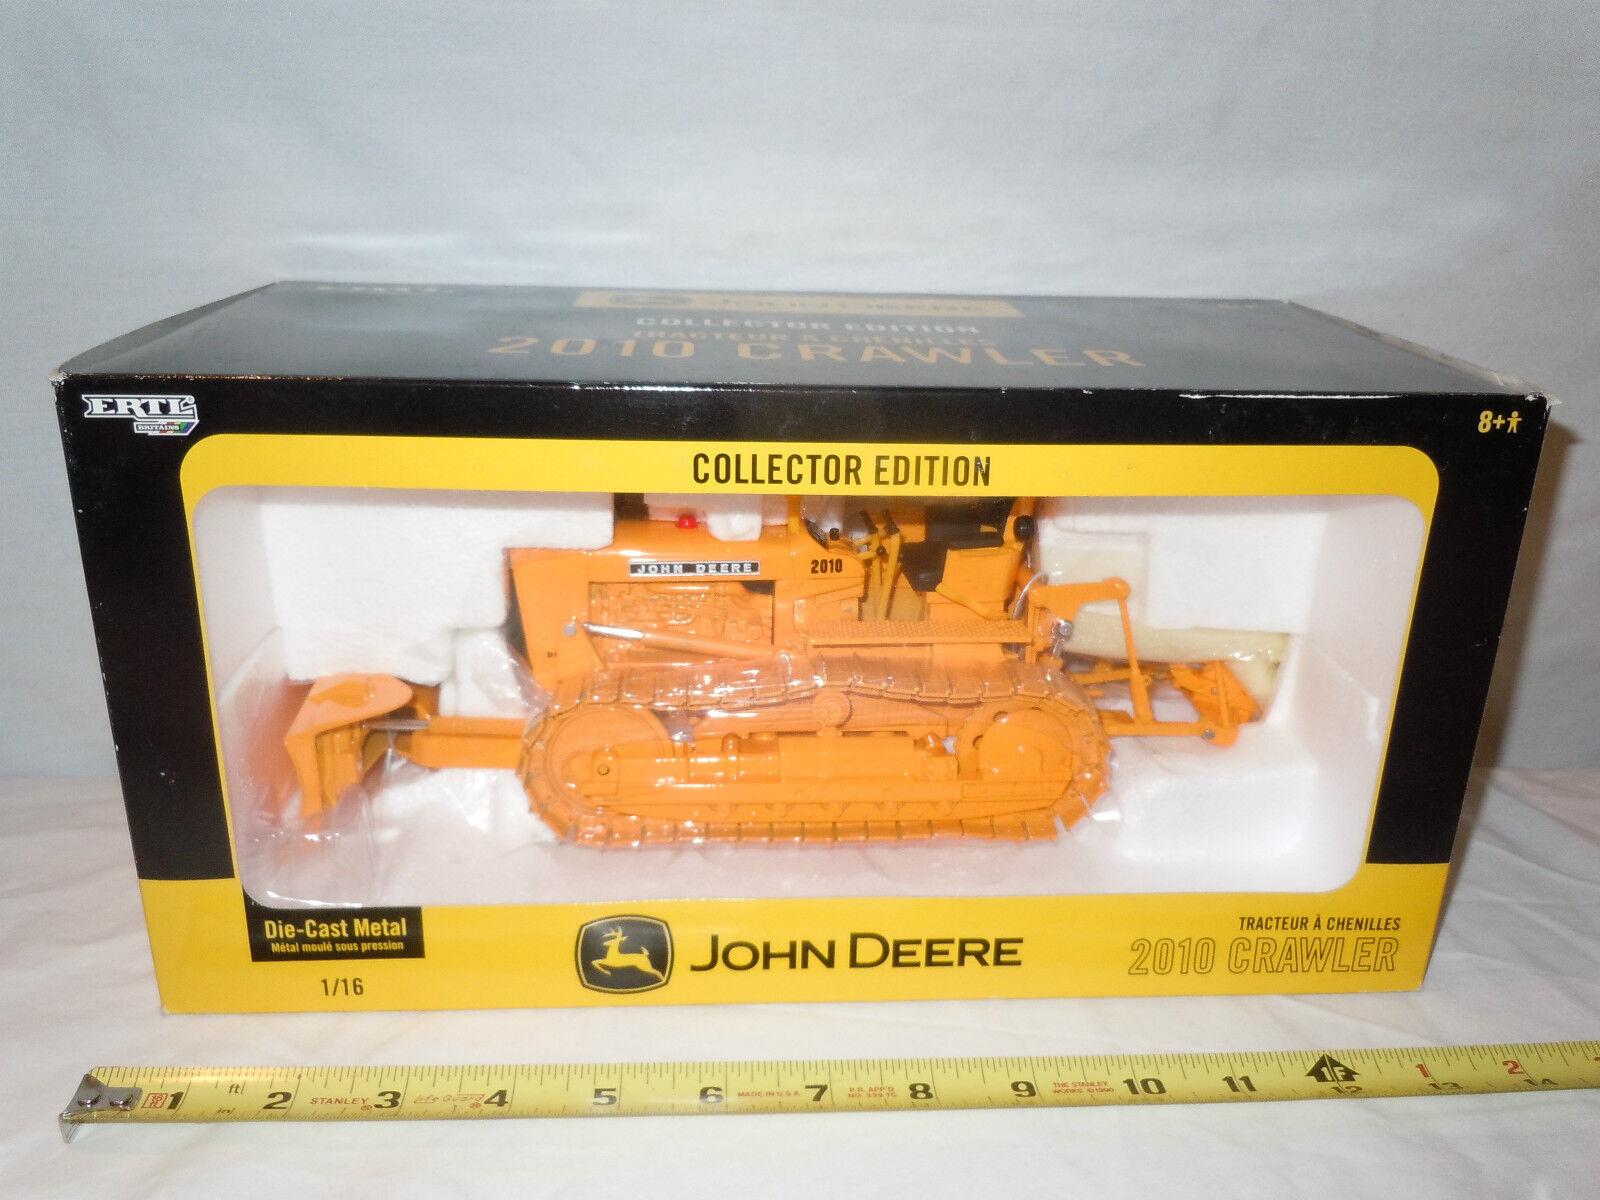 vendita online John Deere 2010 Crawler With Blade & Ripper  Collector Collector Collector edizione   By Ertl     vendita scontata online di factory outlet